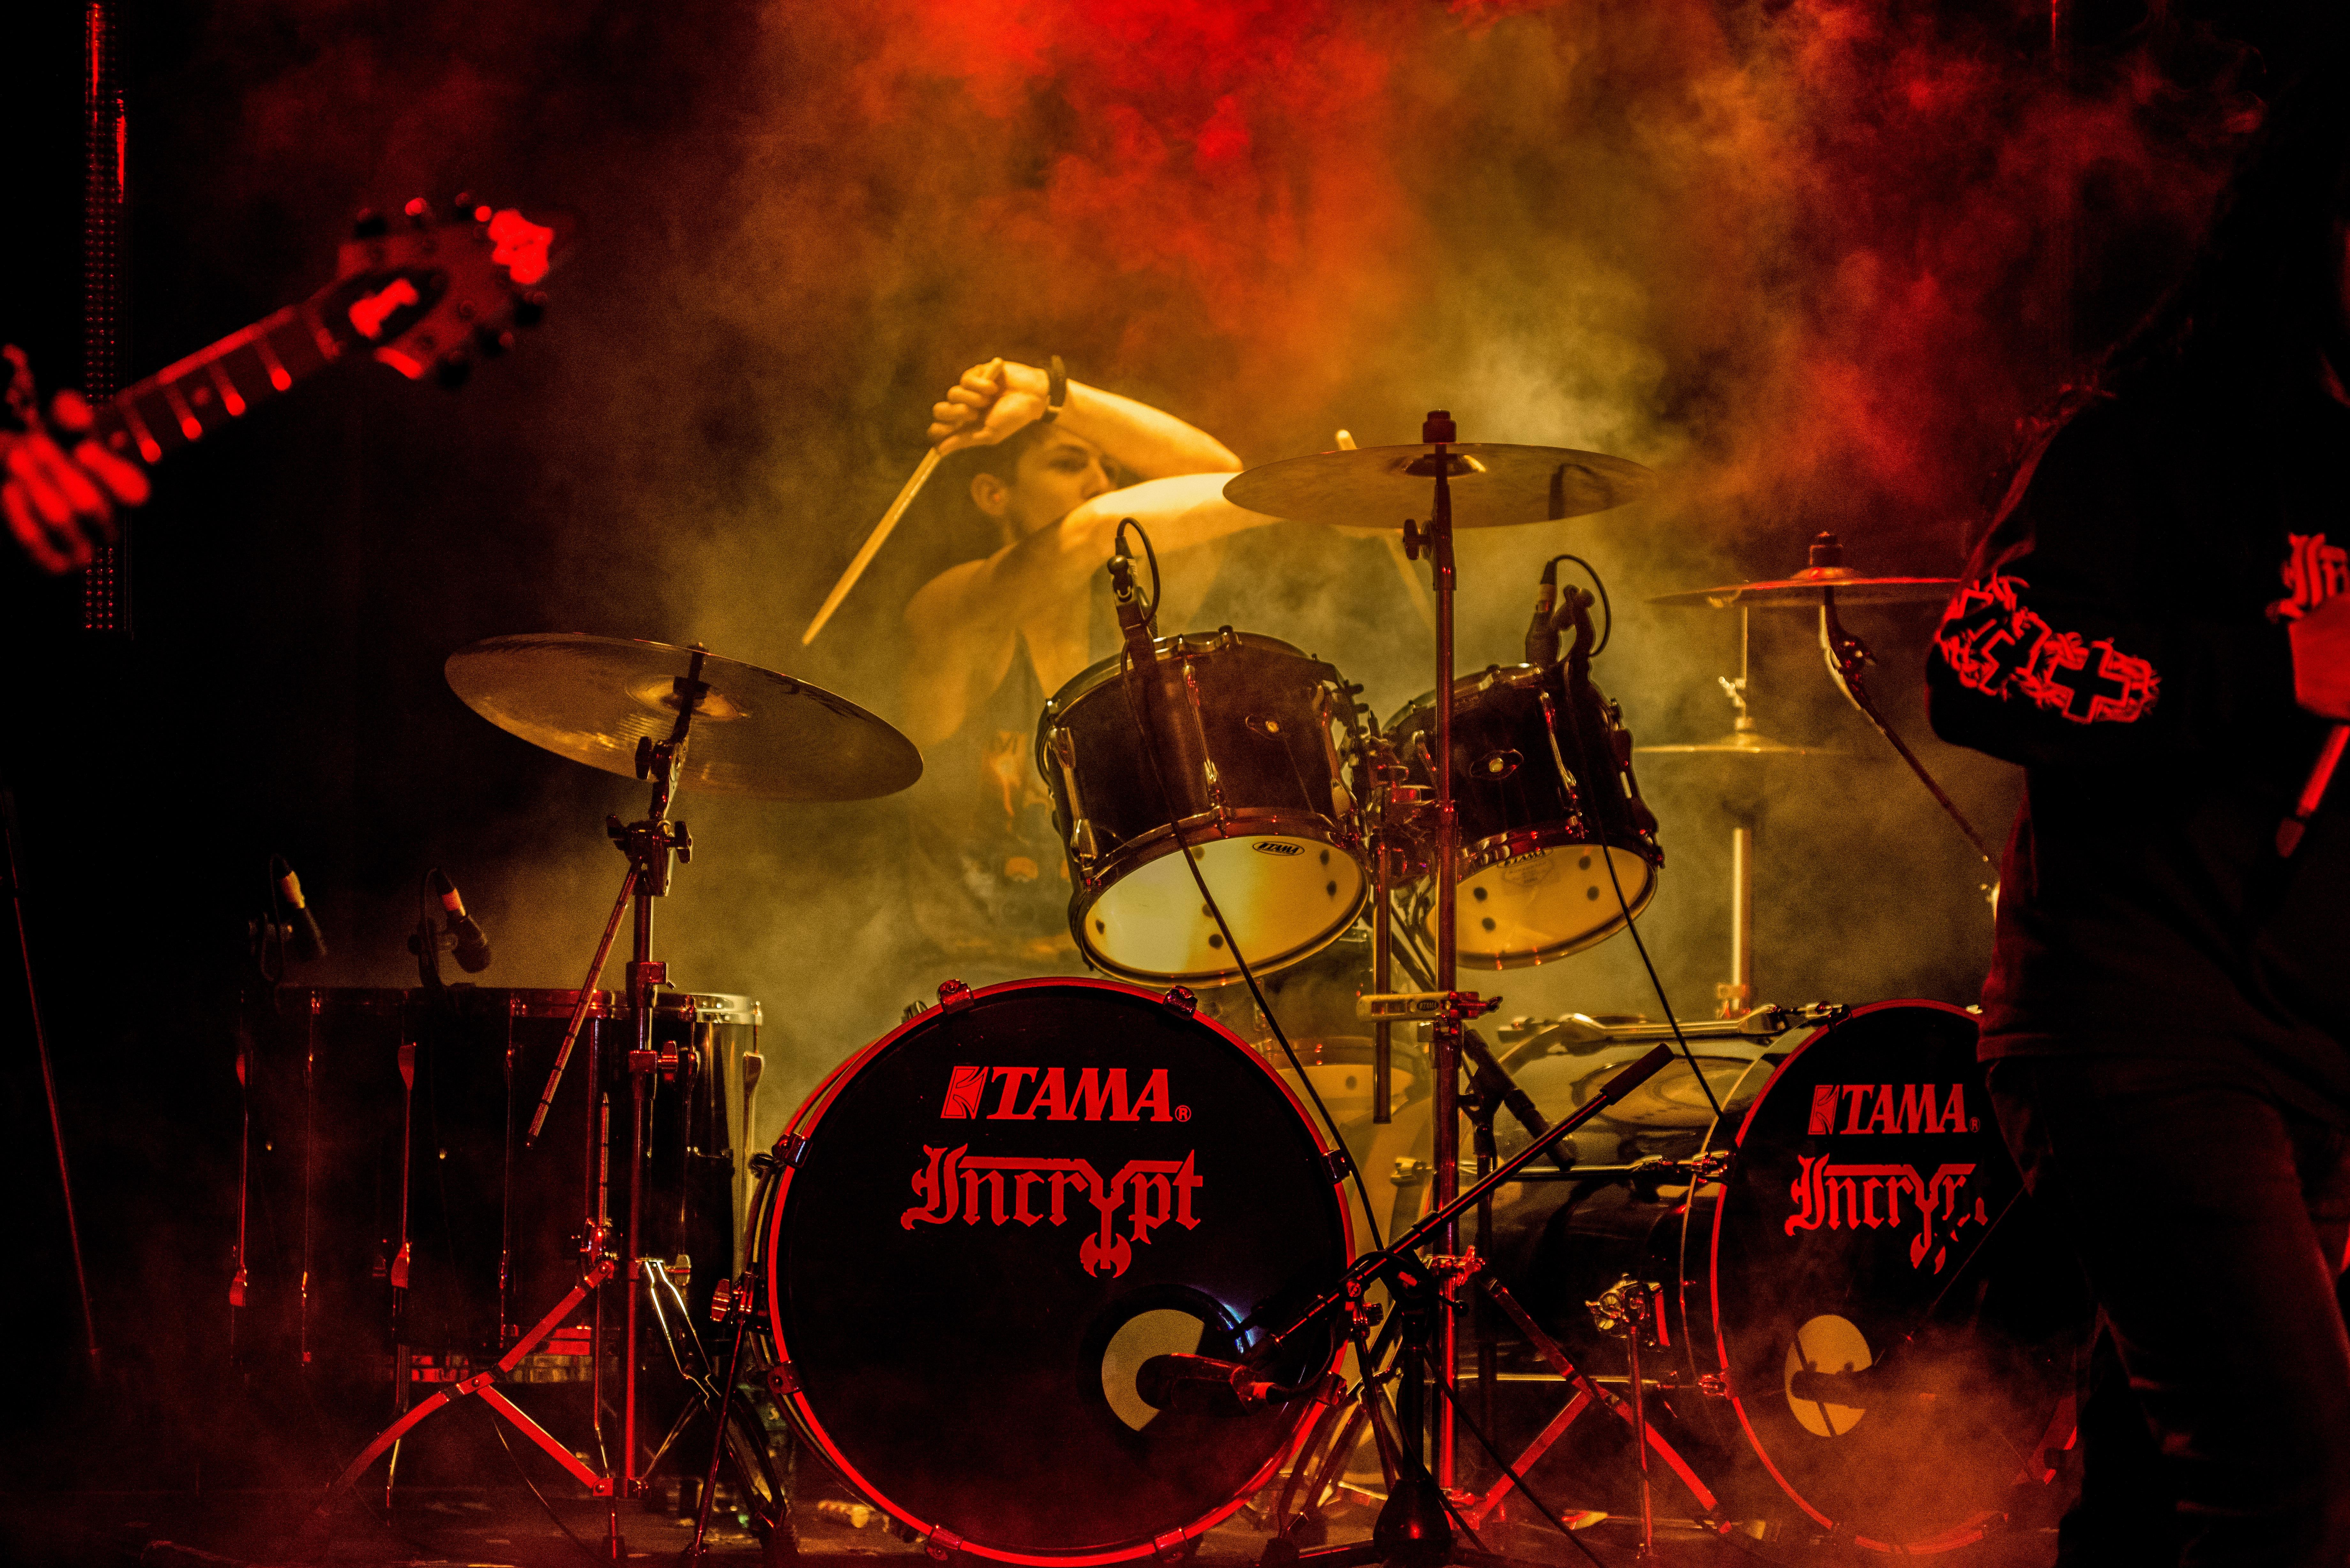 free images music band musician set drum stage performance kit guitarist drums. Black Bedroom Furniture Sets. Home Design Ideas